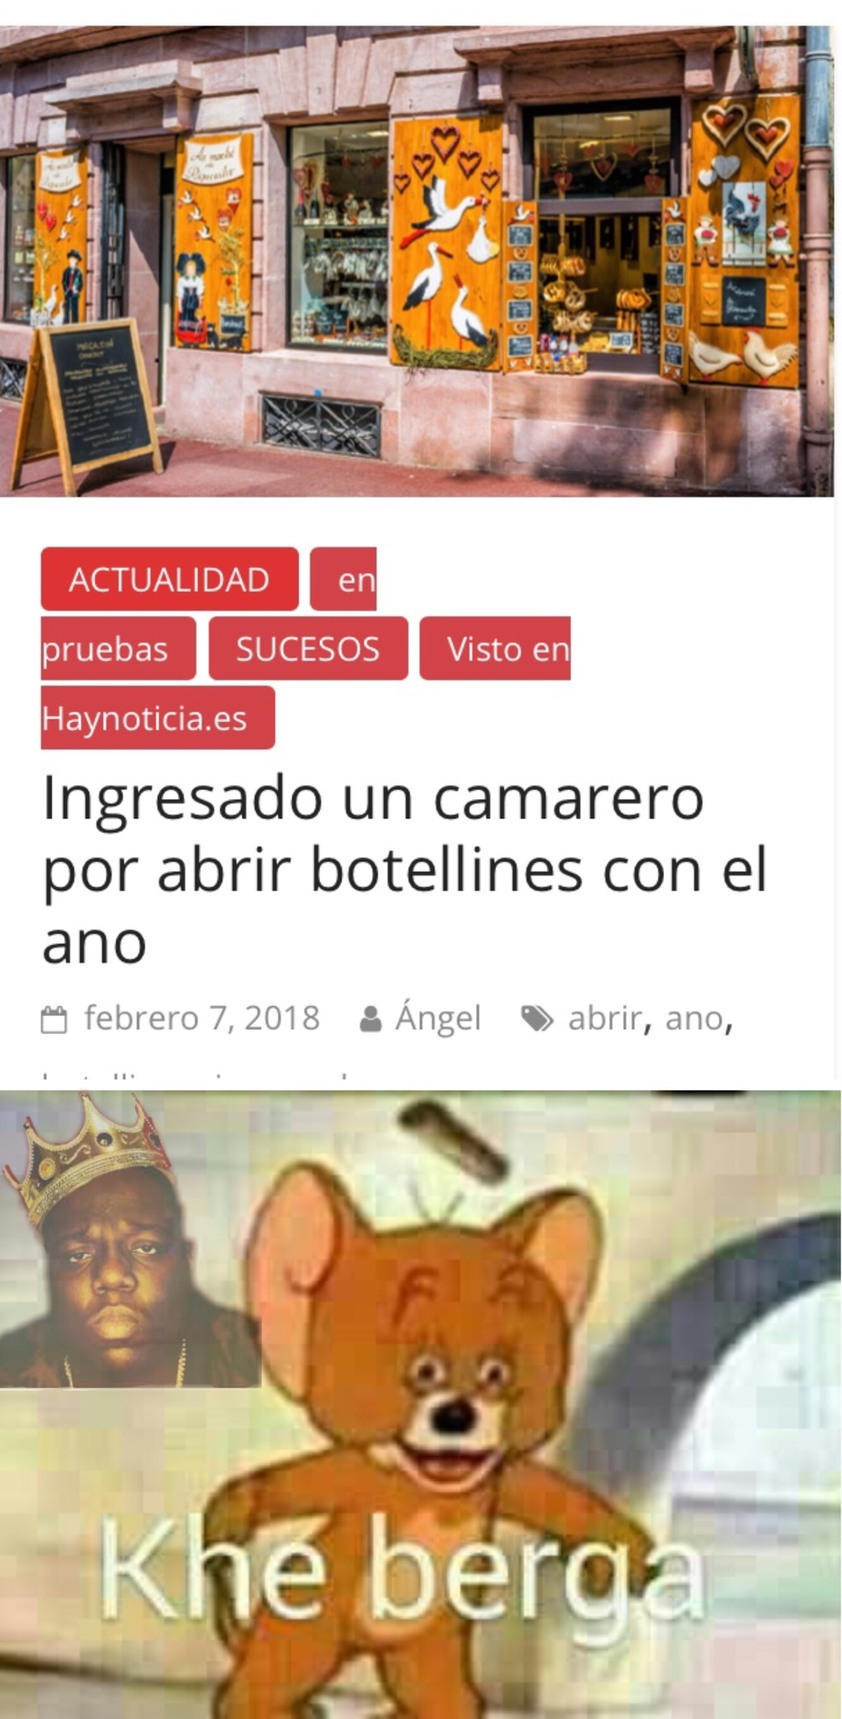 zukulento - meme